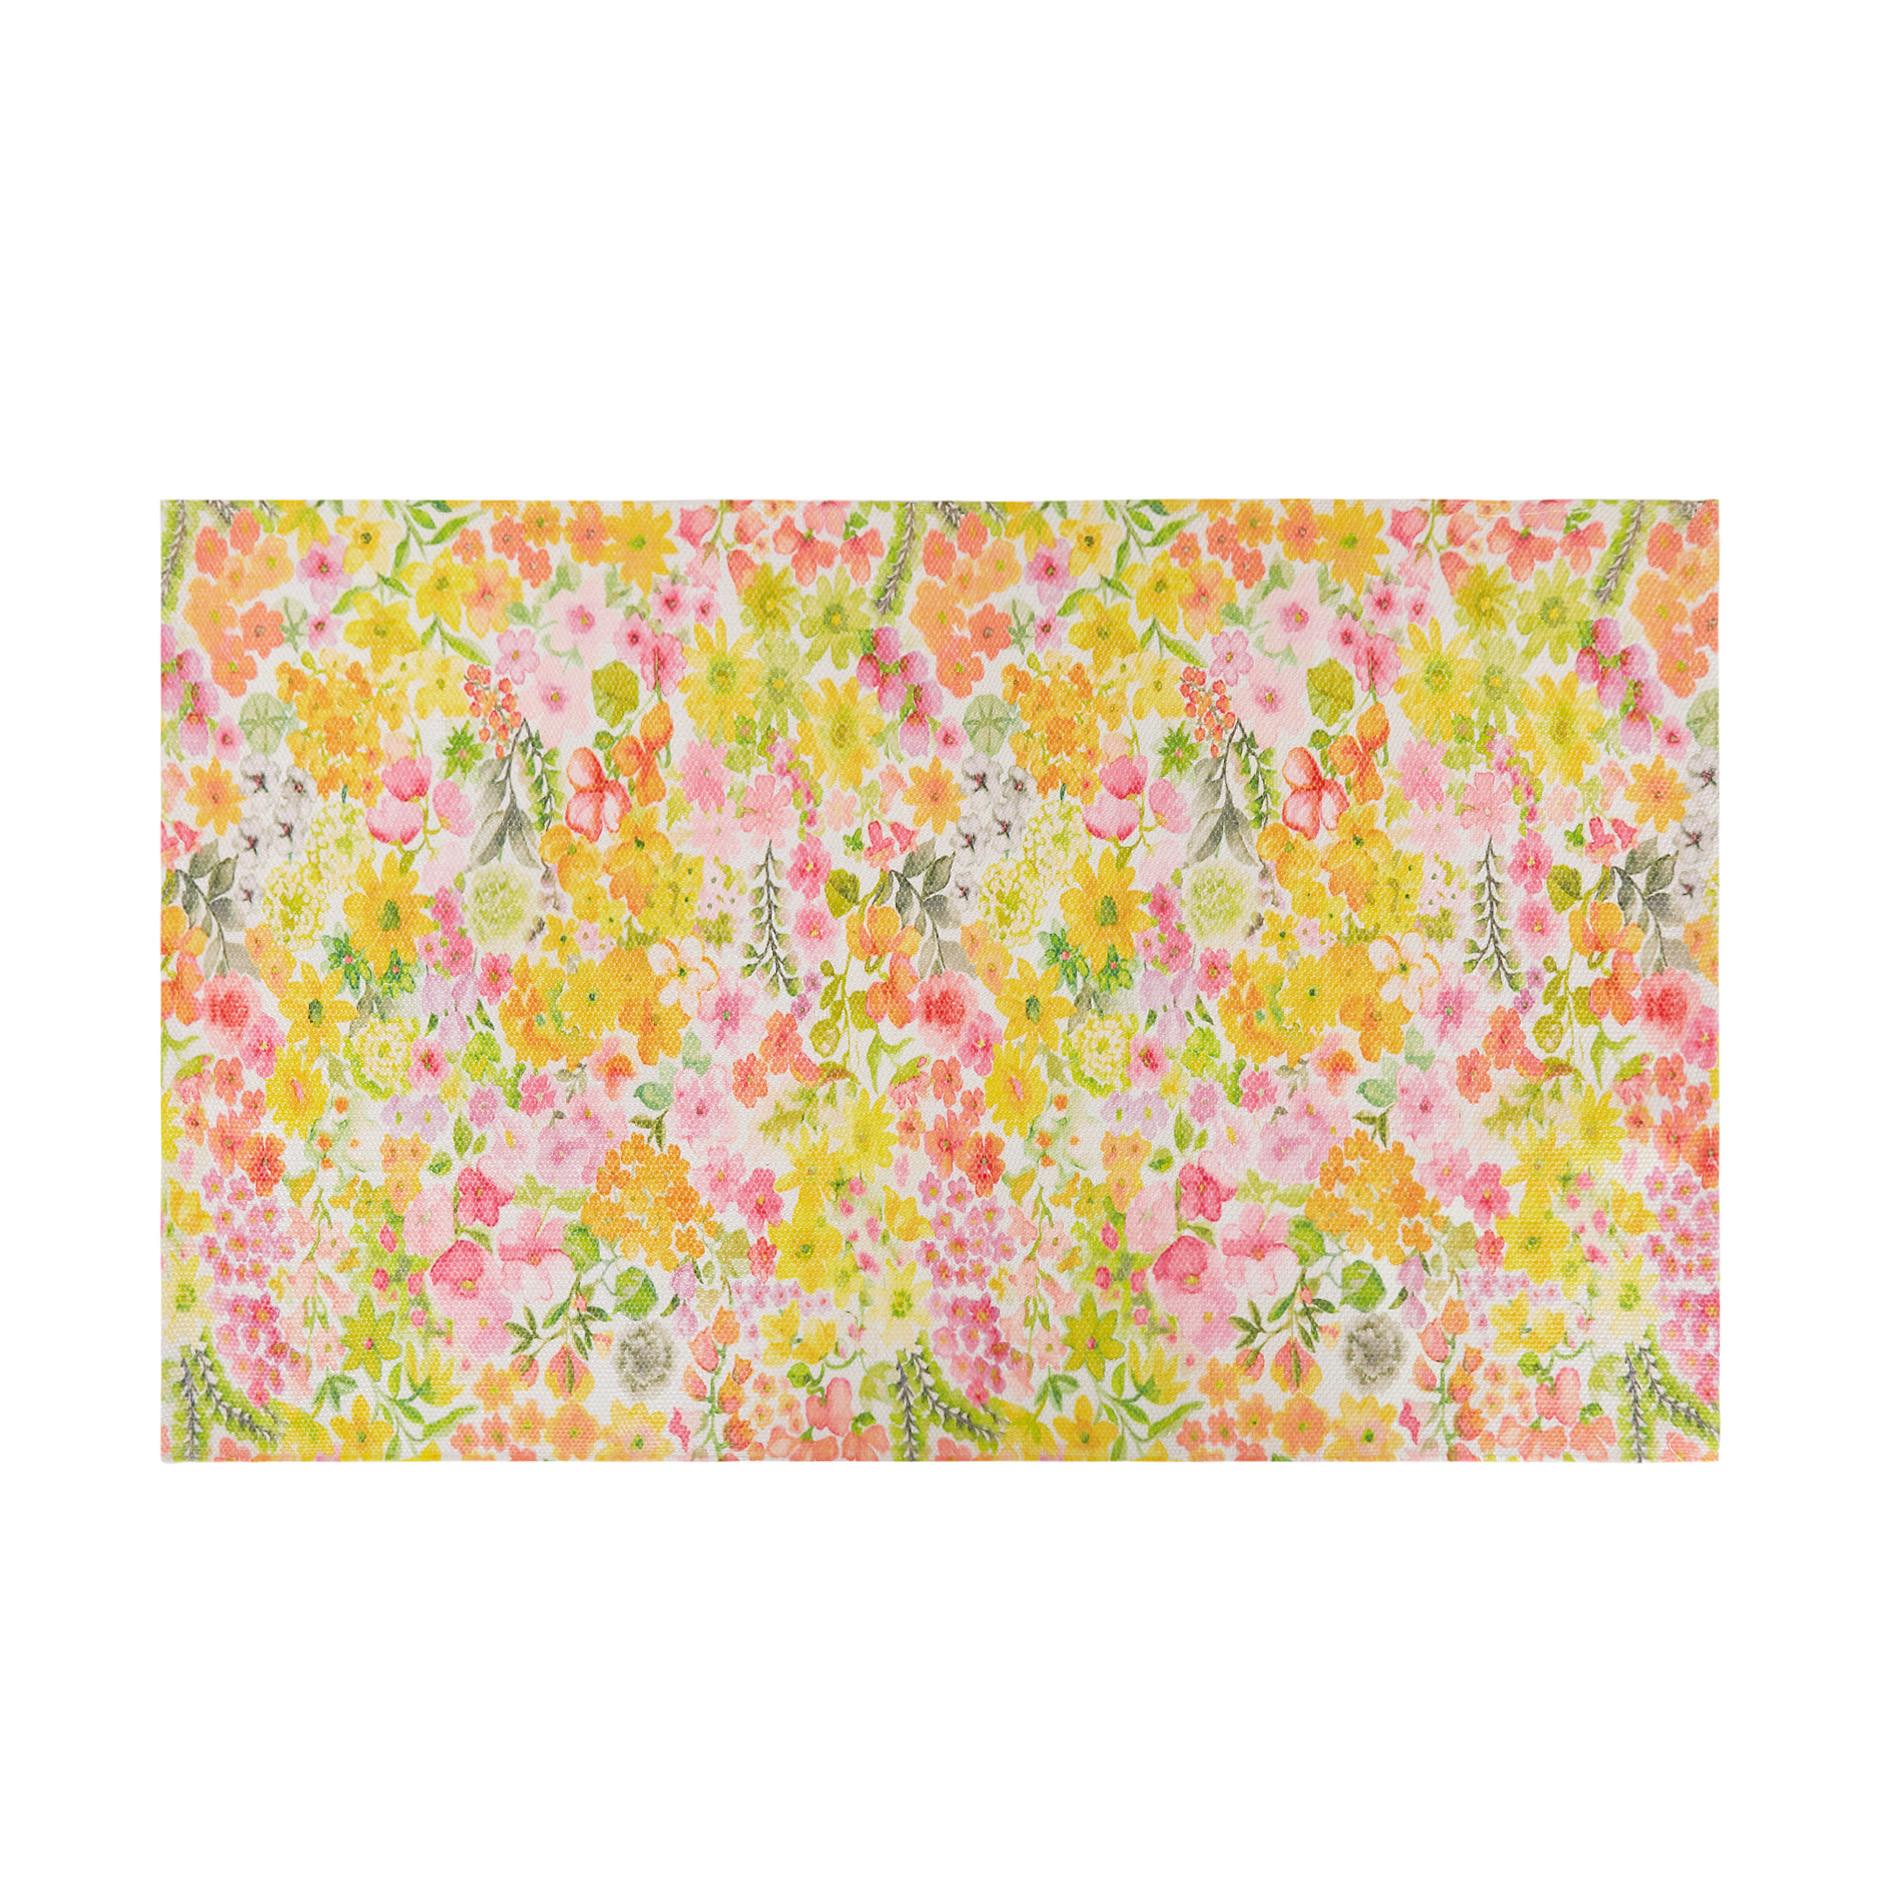 Tappeto da cucina stampa floreale, Multicolor, large image number 0